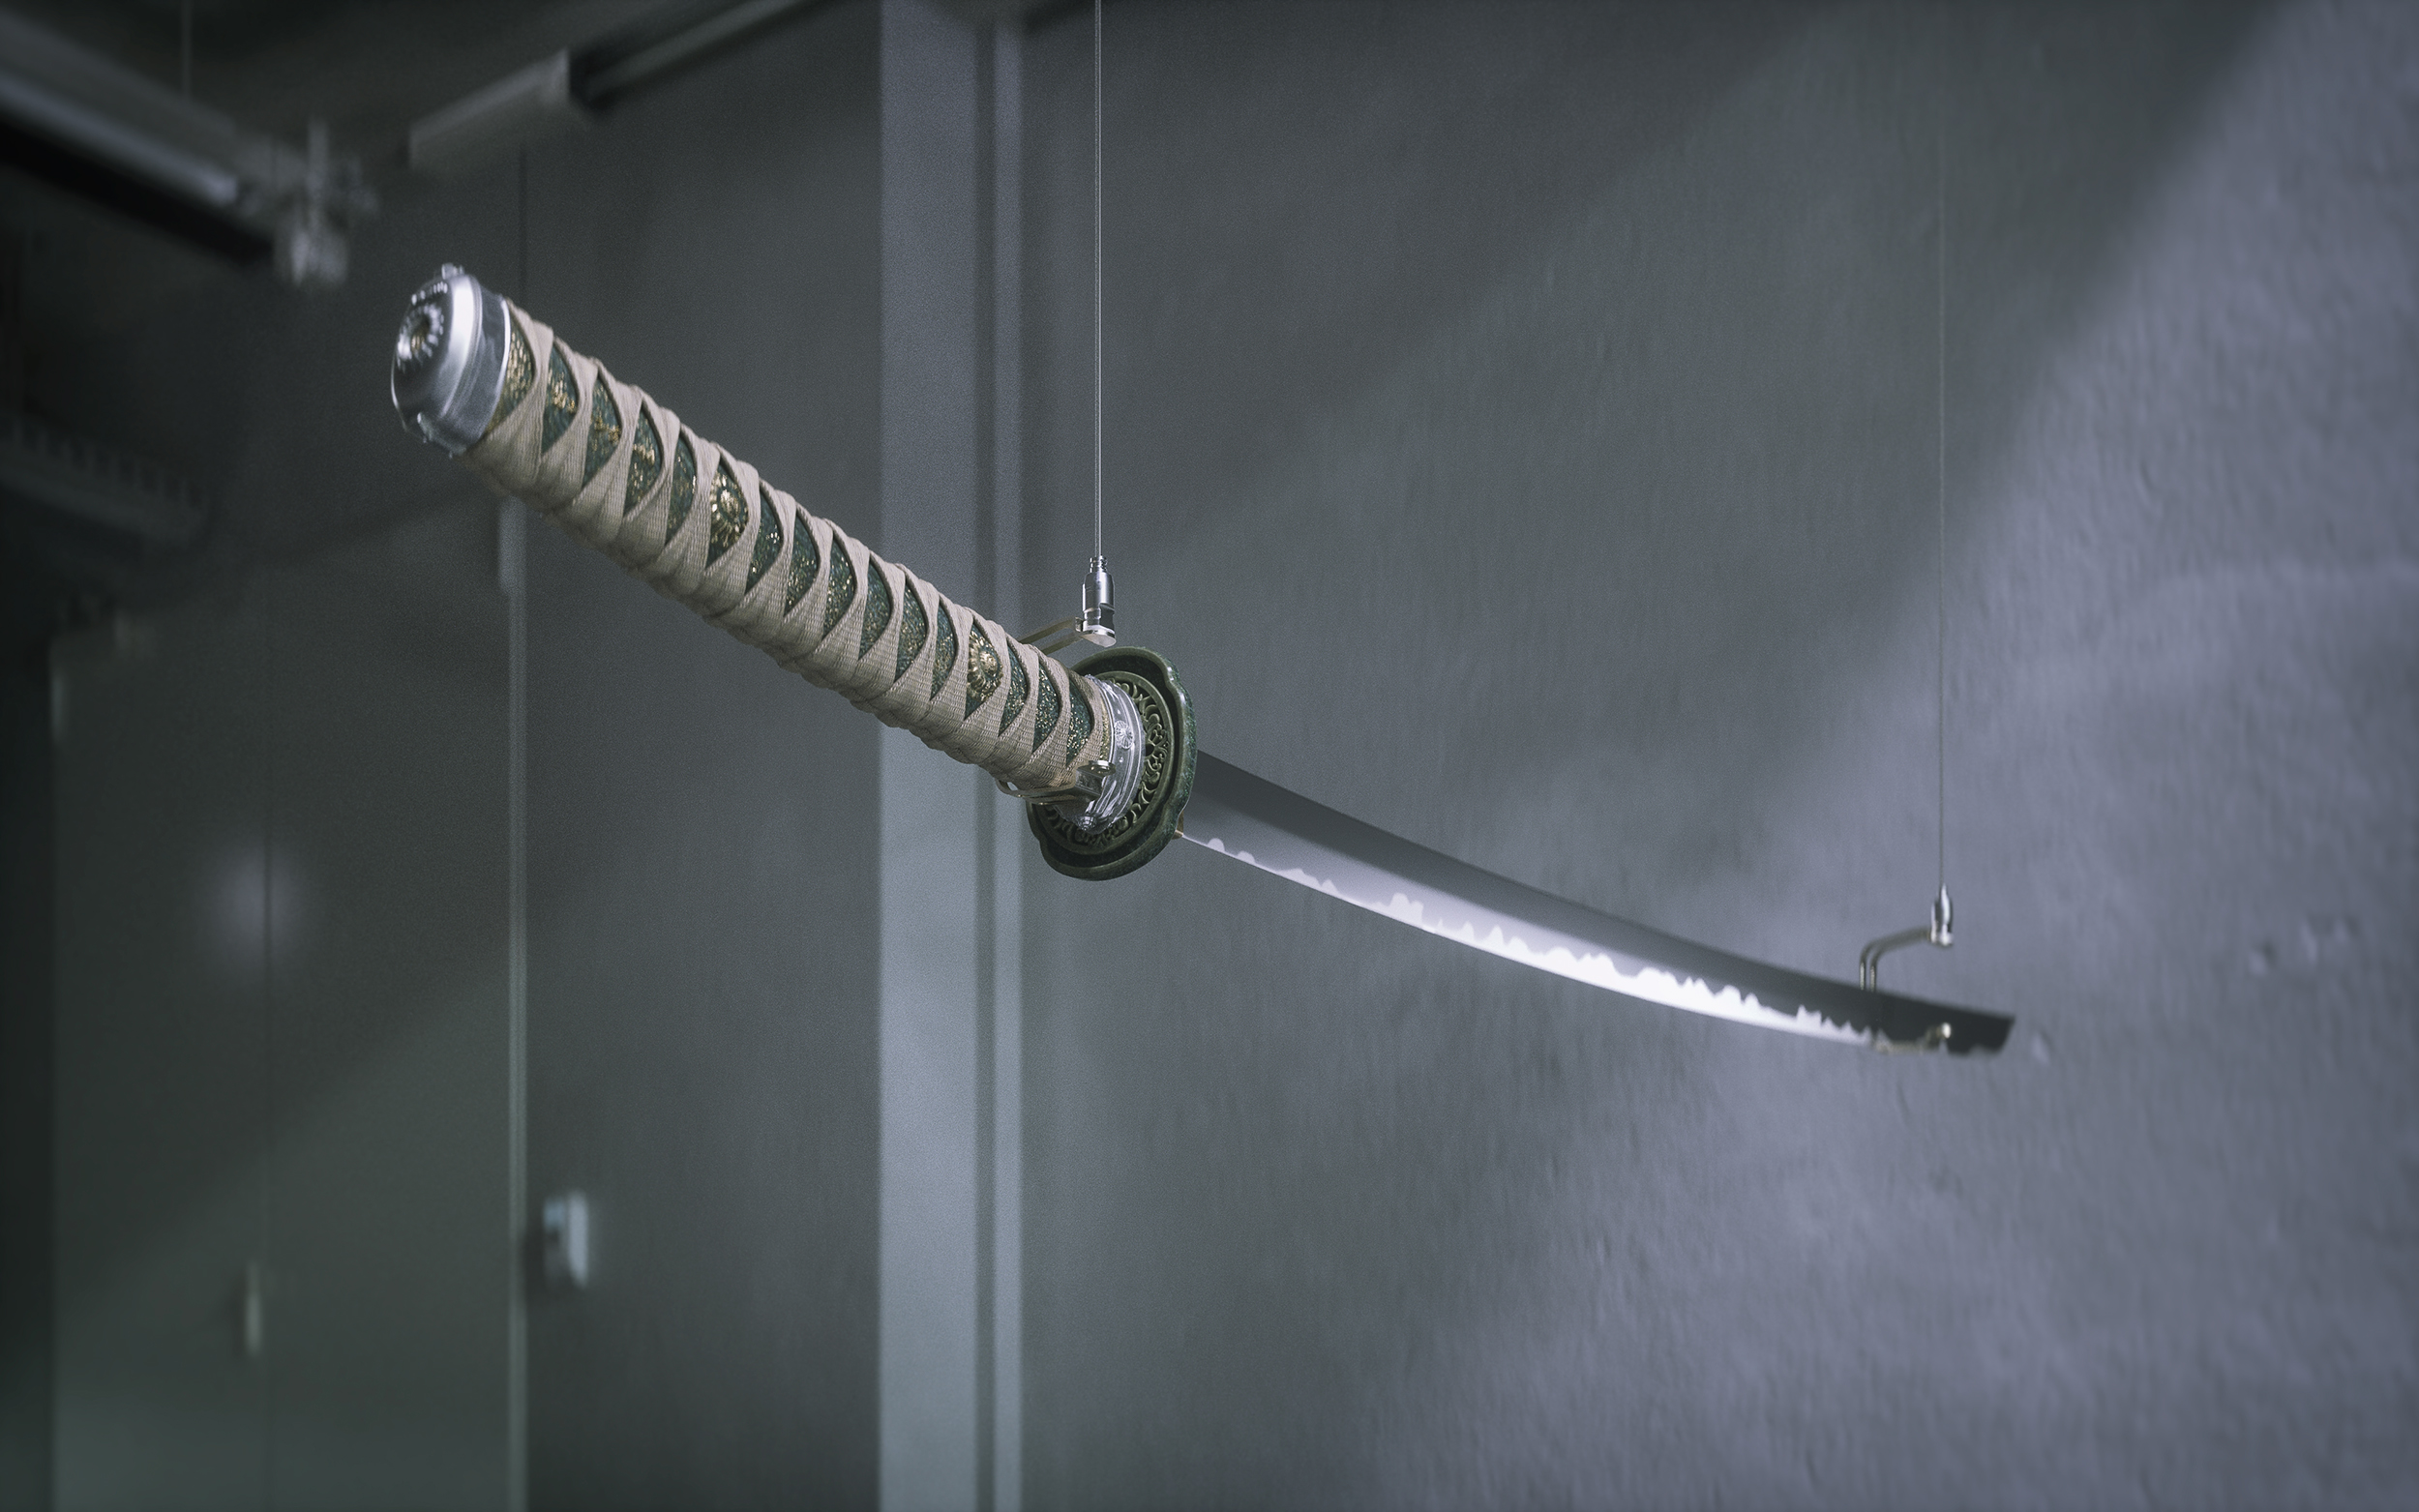 z01_01_sword_side0000